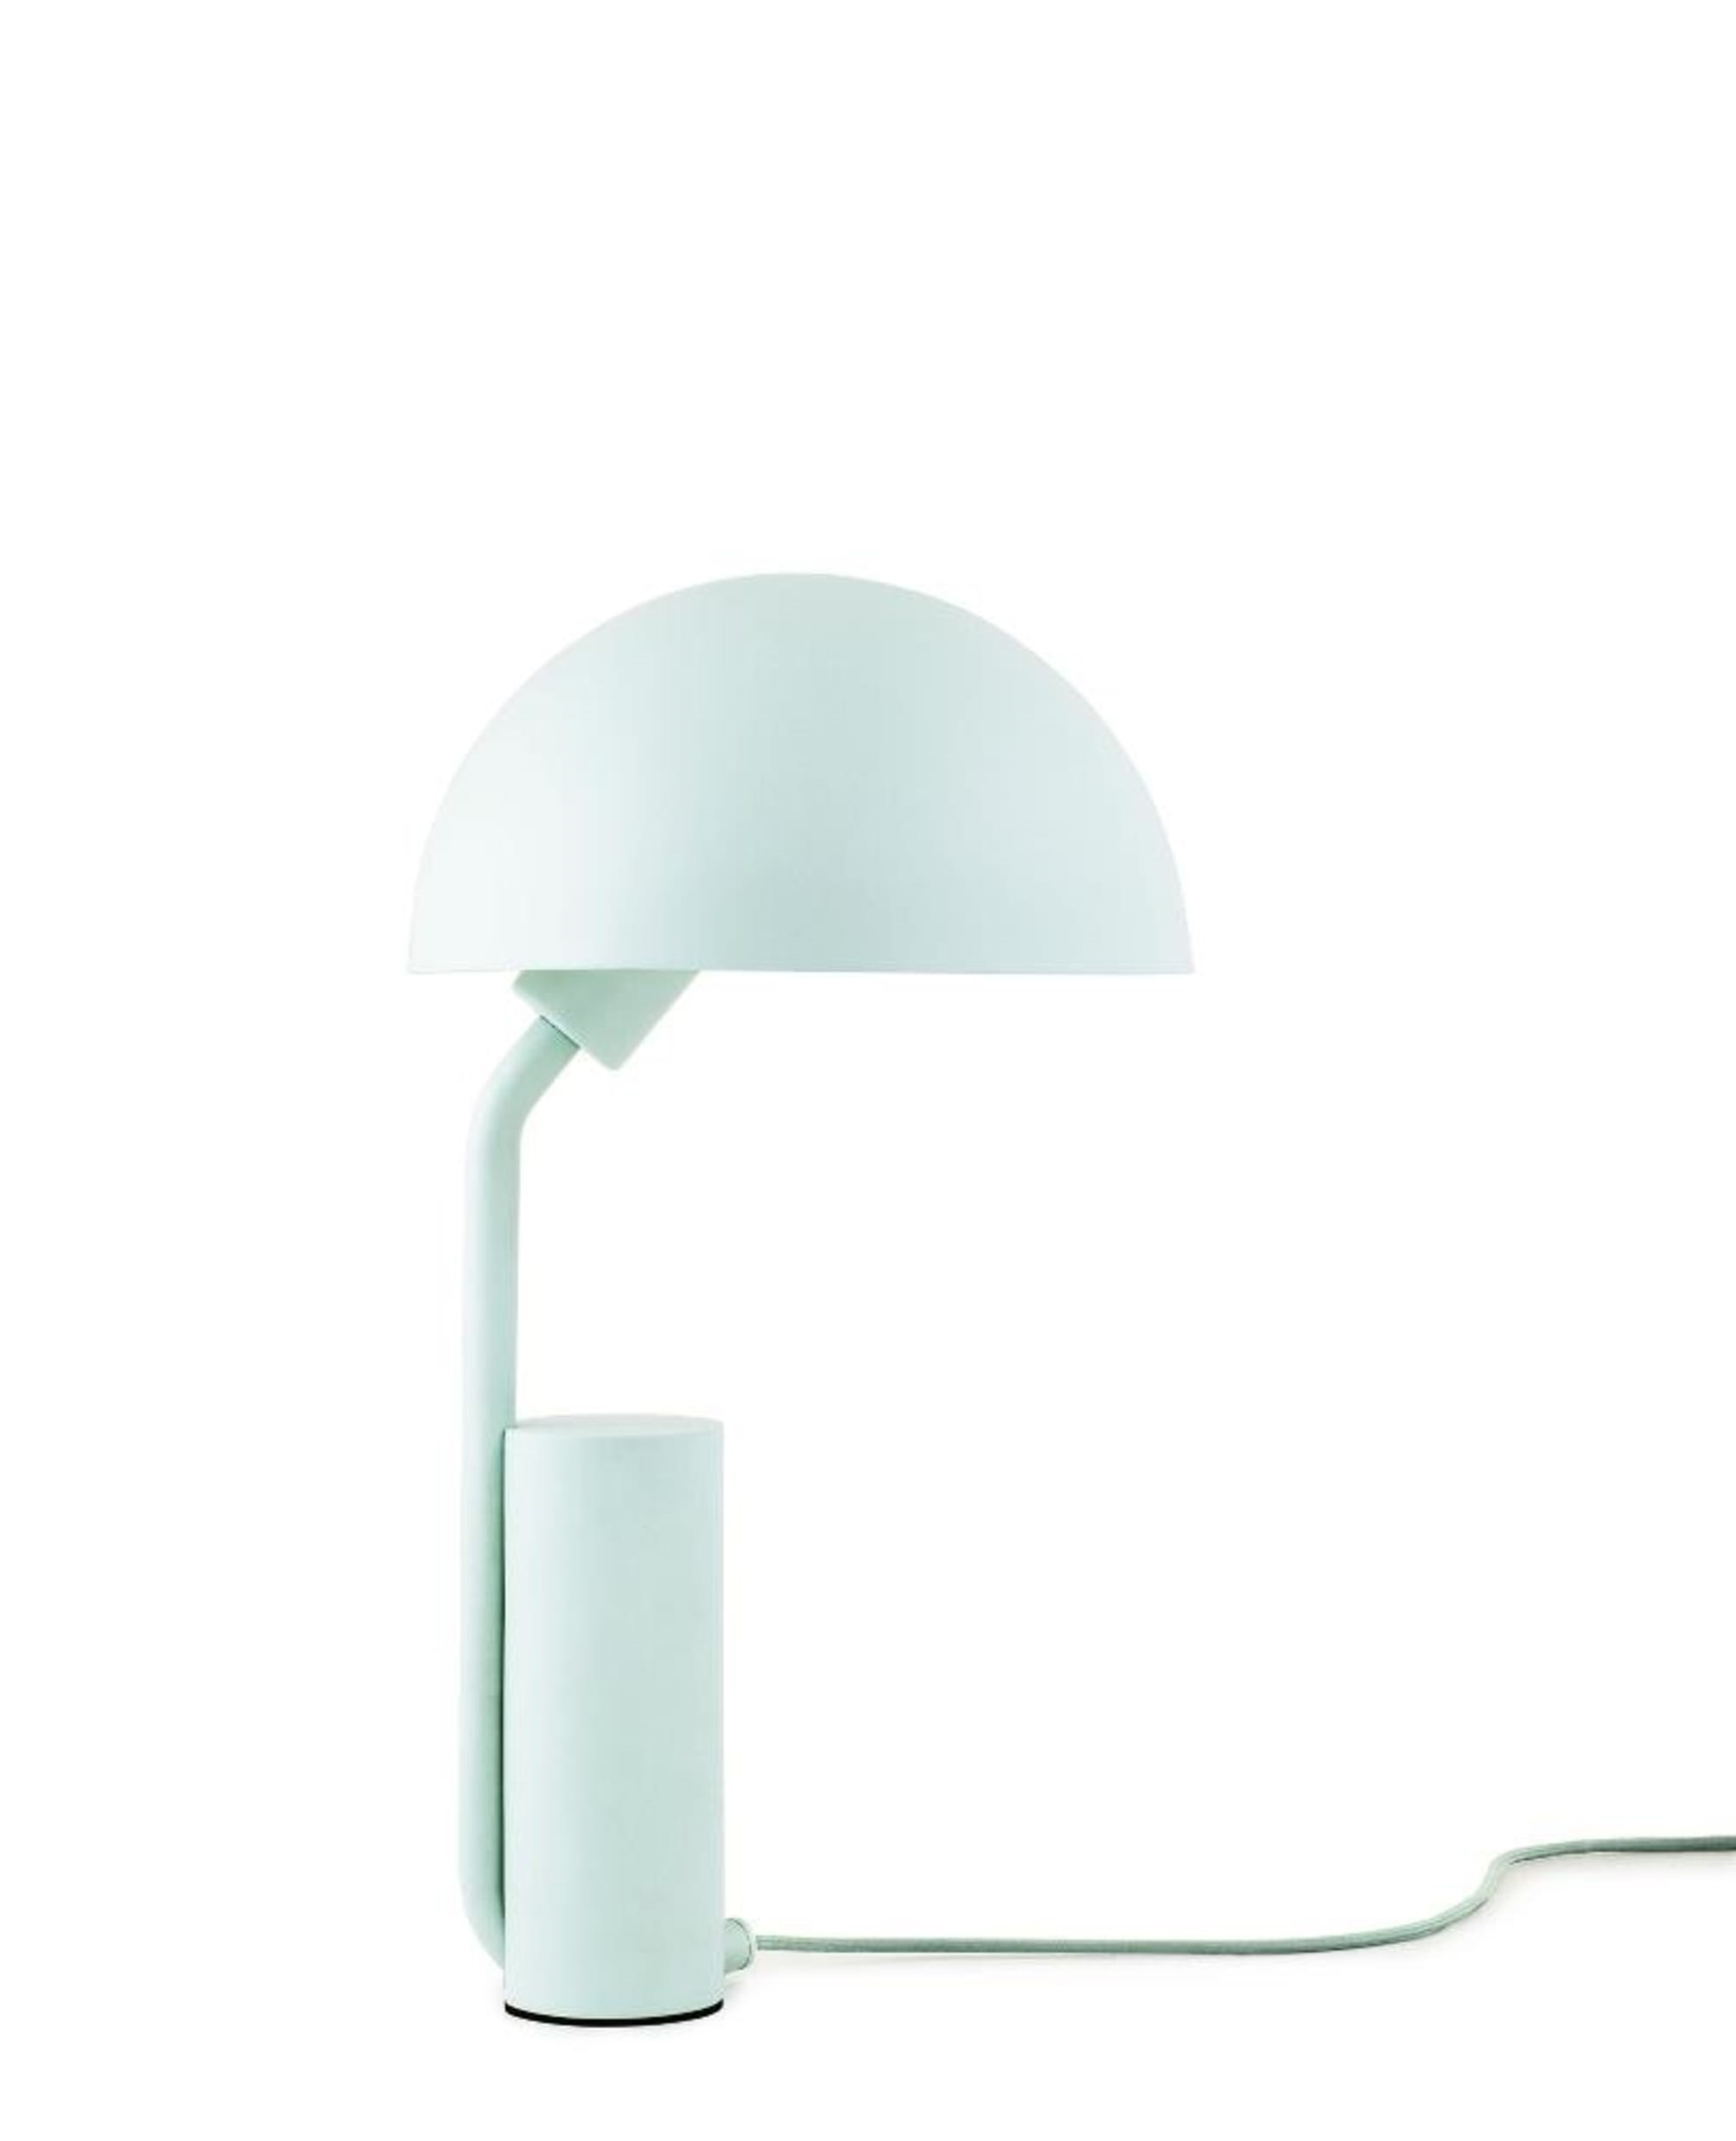 Lampe Design Nordique